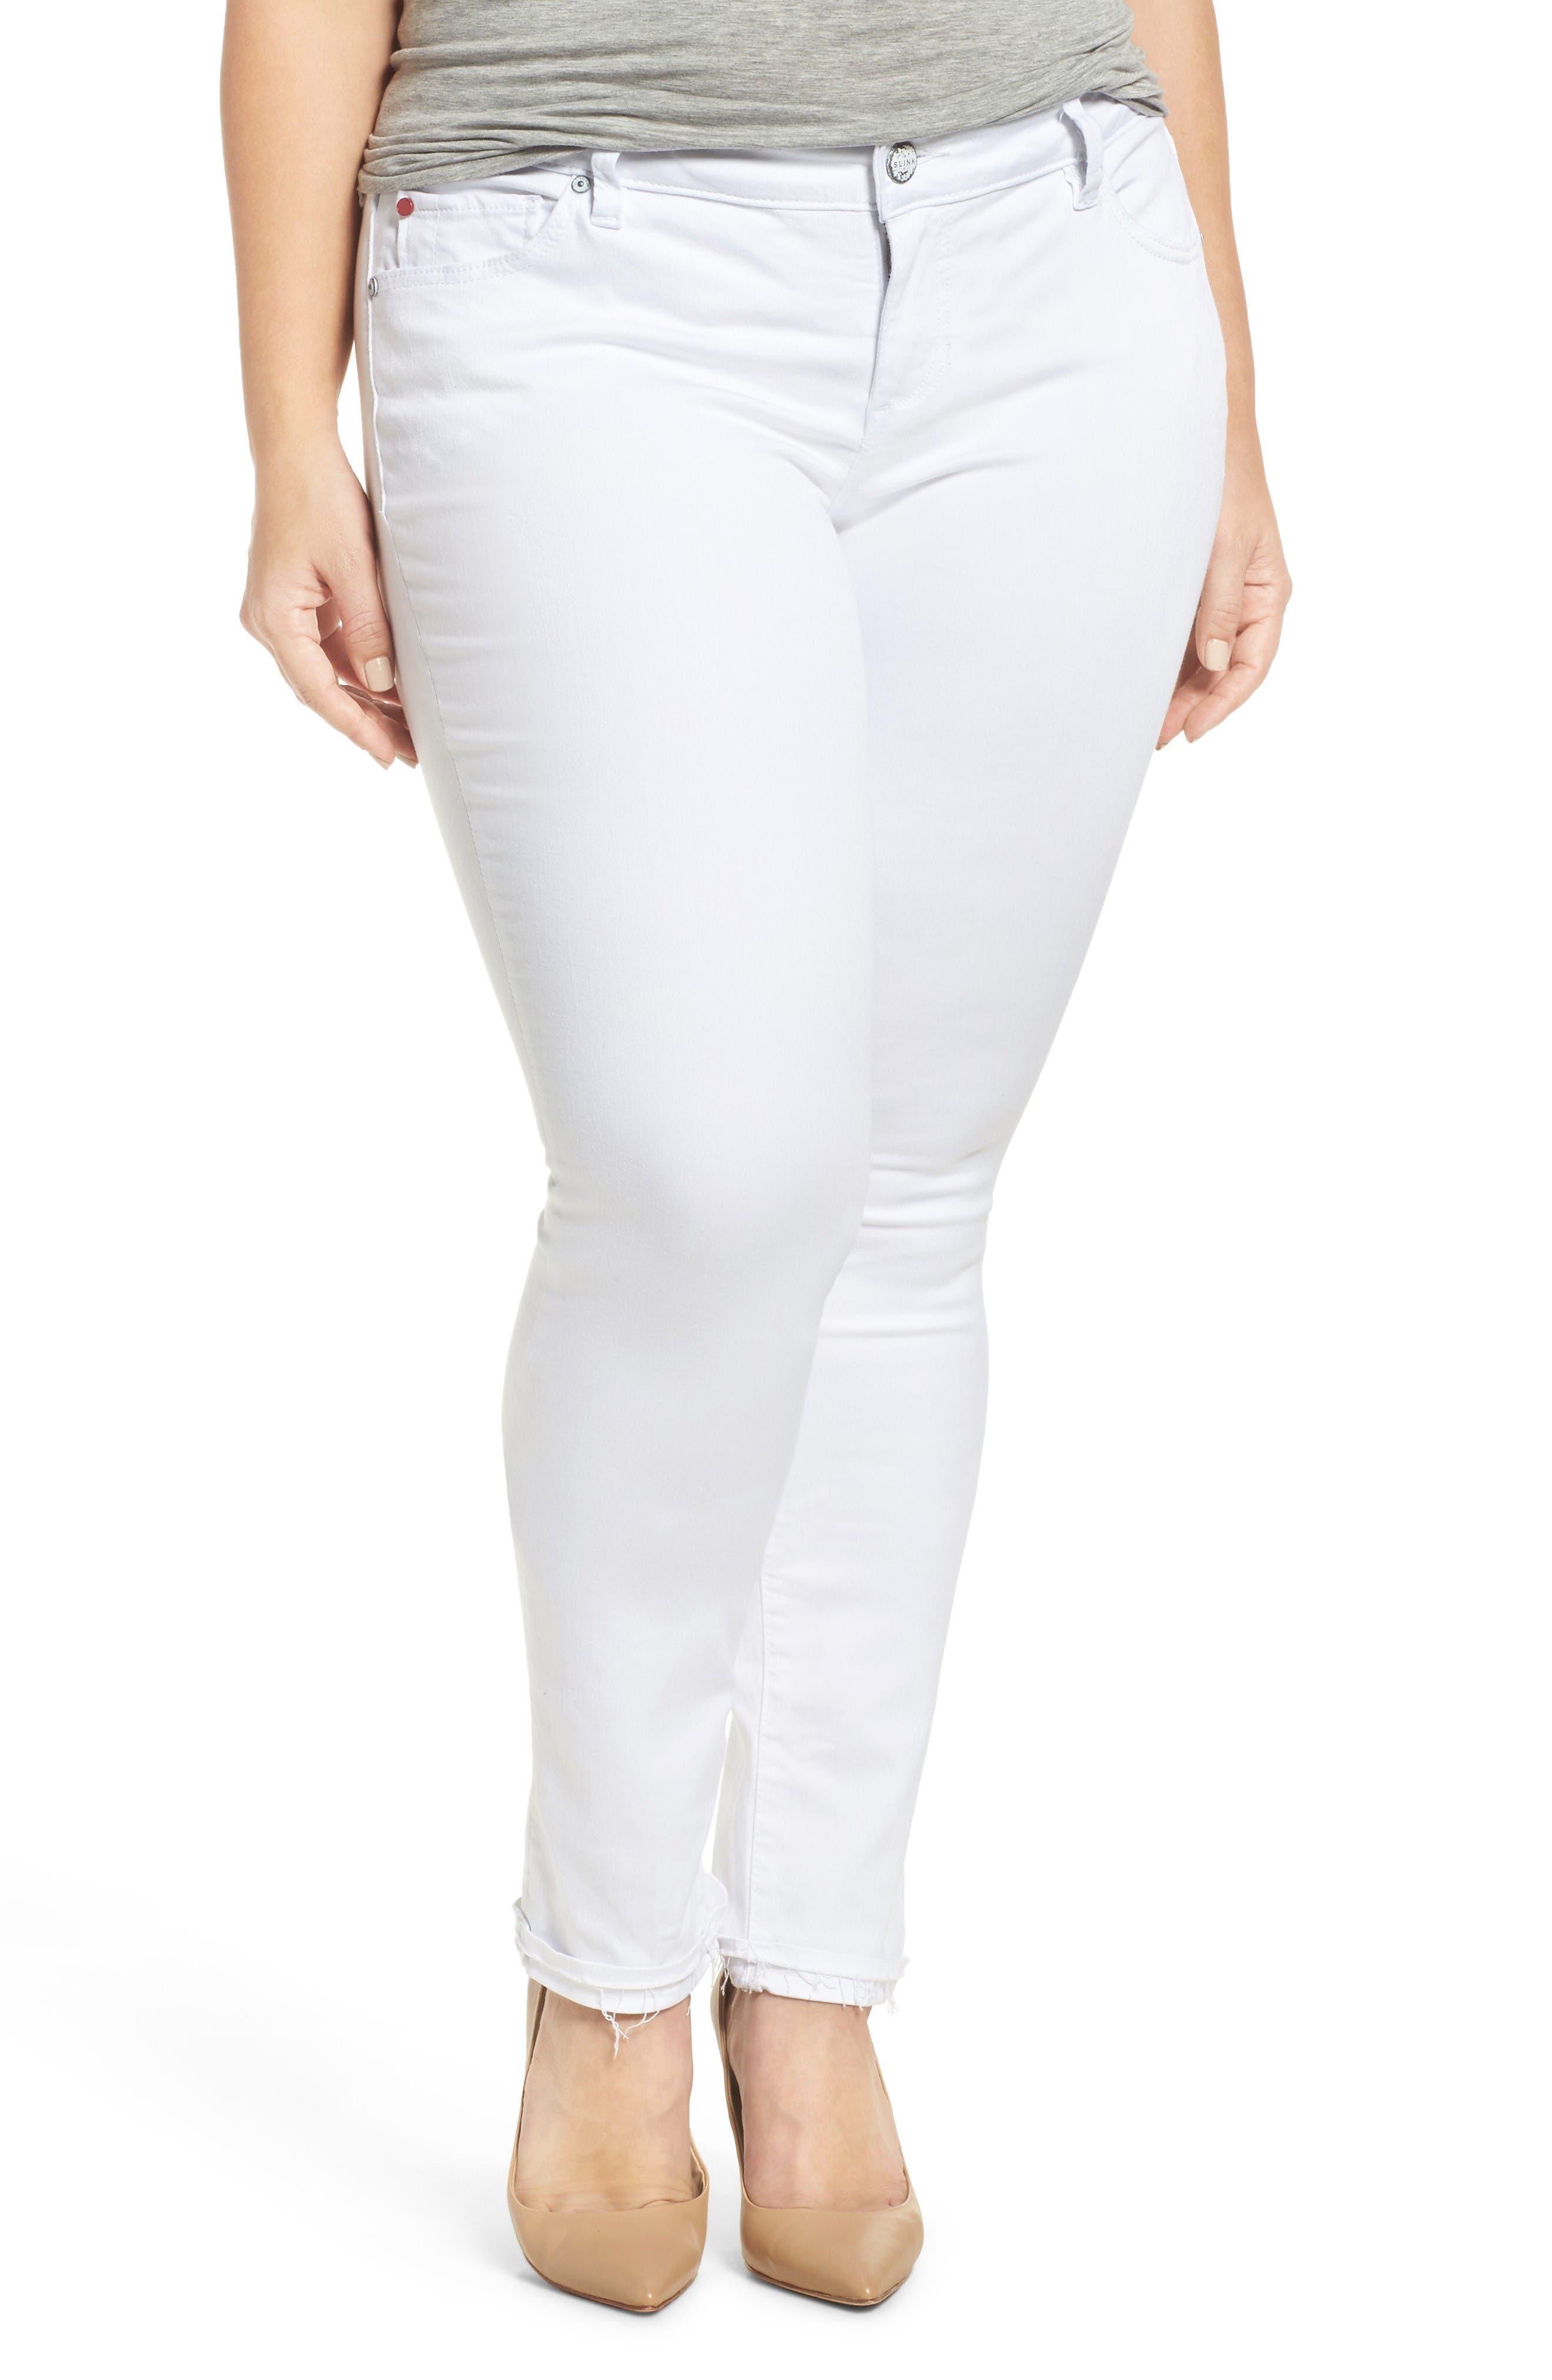 Main Image - SLINK Jeans Release Hem Skinny Jeans (Lexy) (Plus Size)